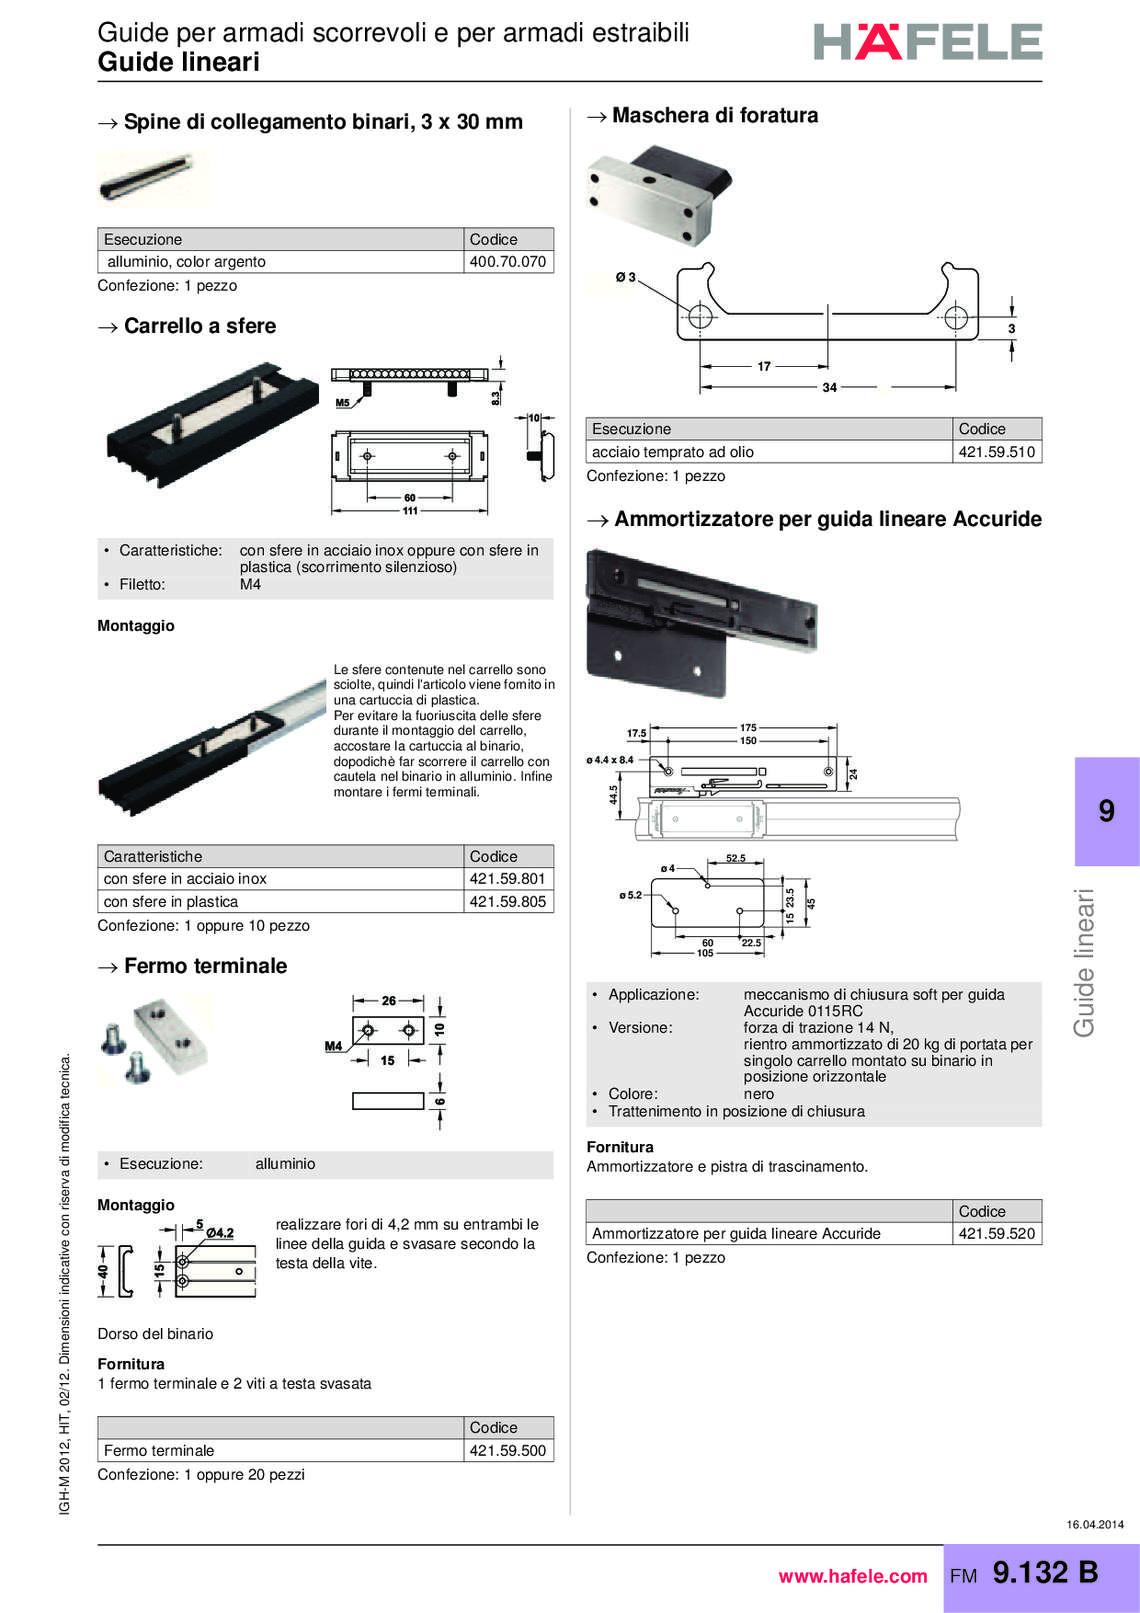 hafele-spondine-e-guide-per-mobili_40_186.jpg